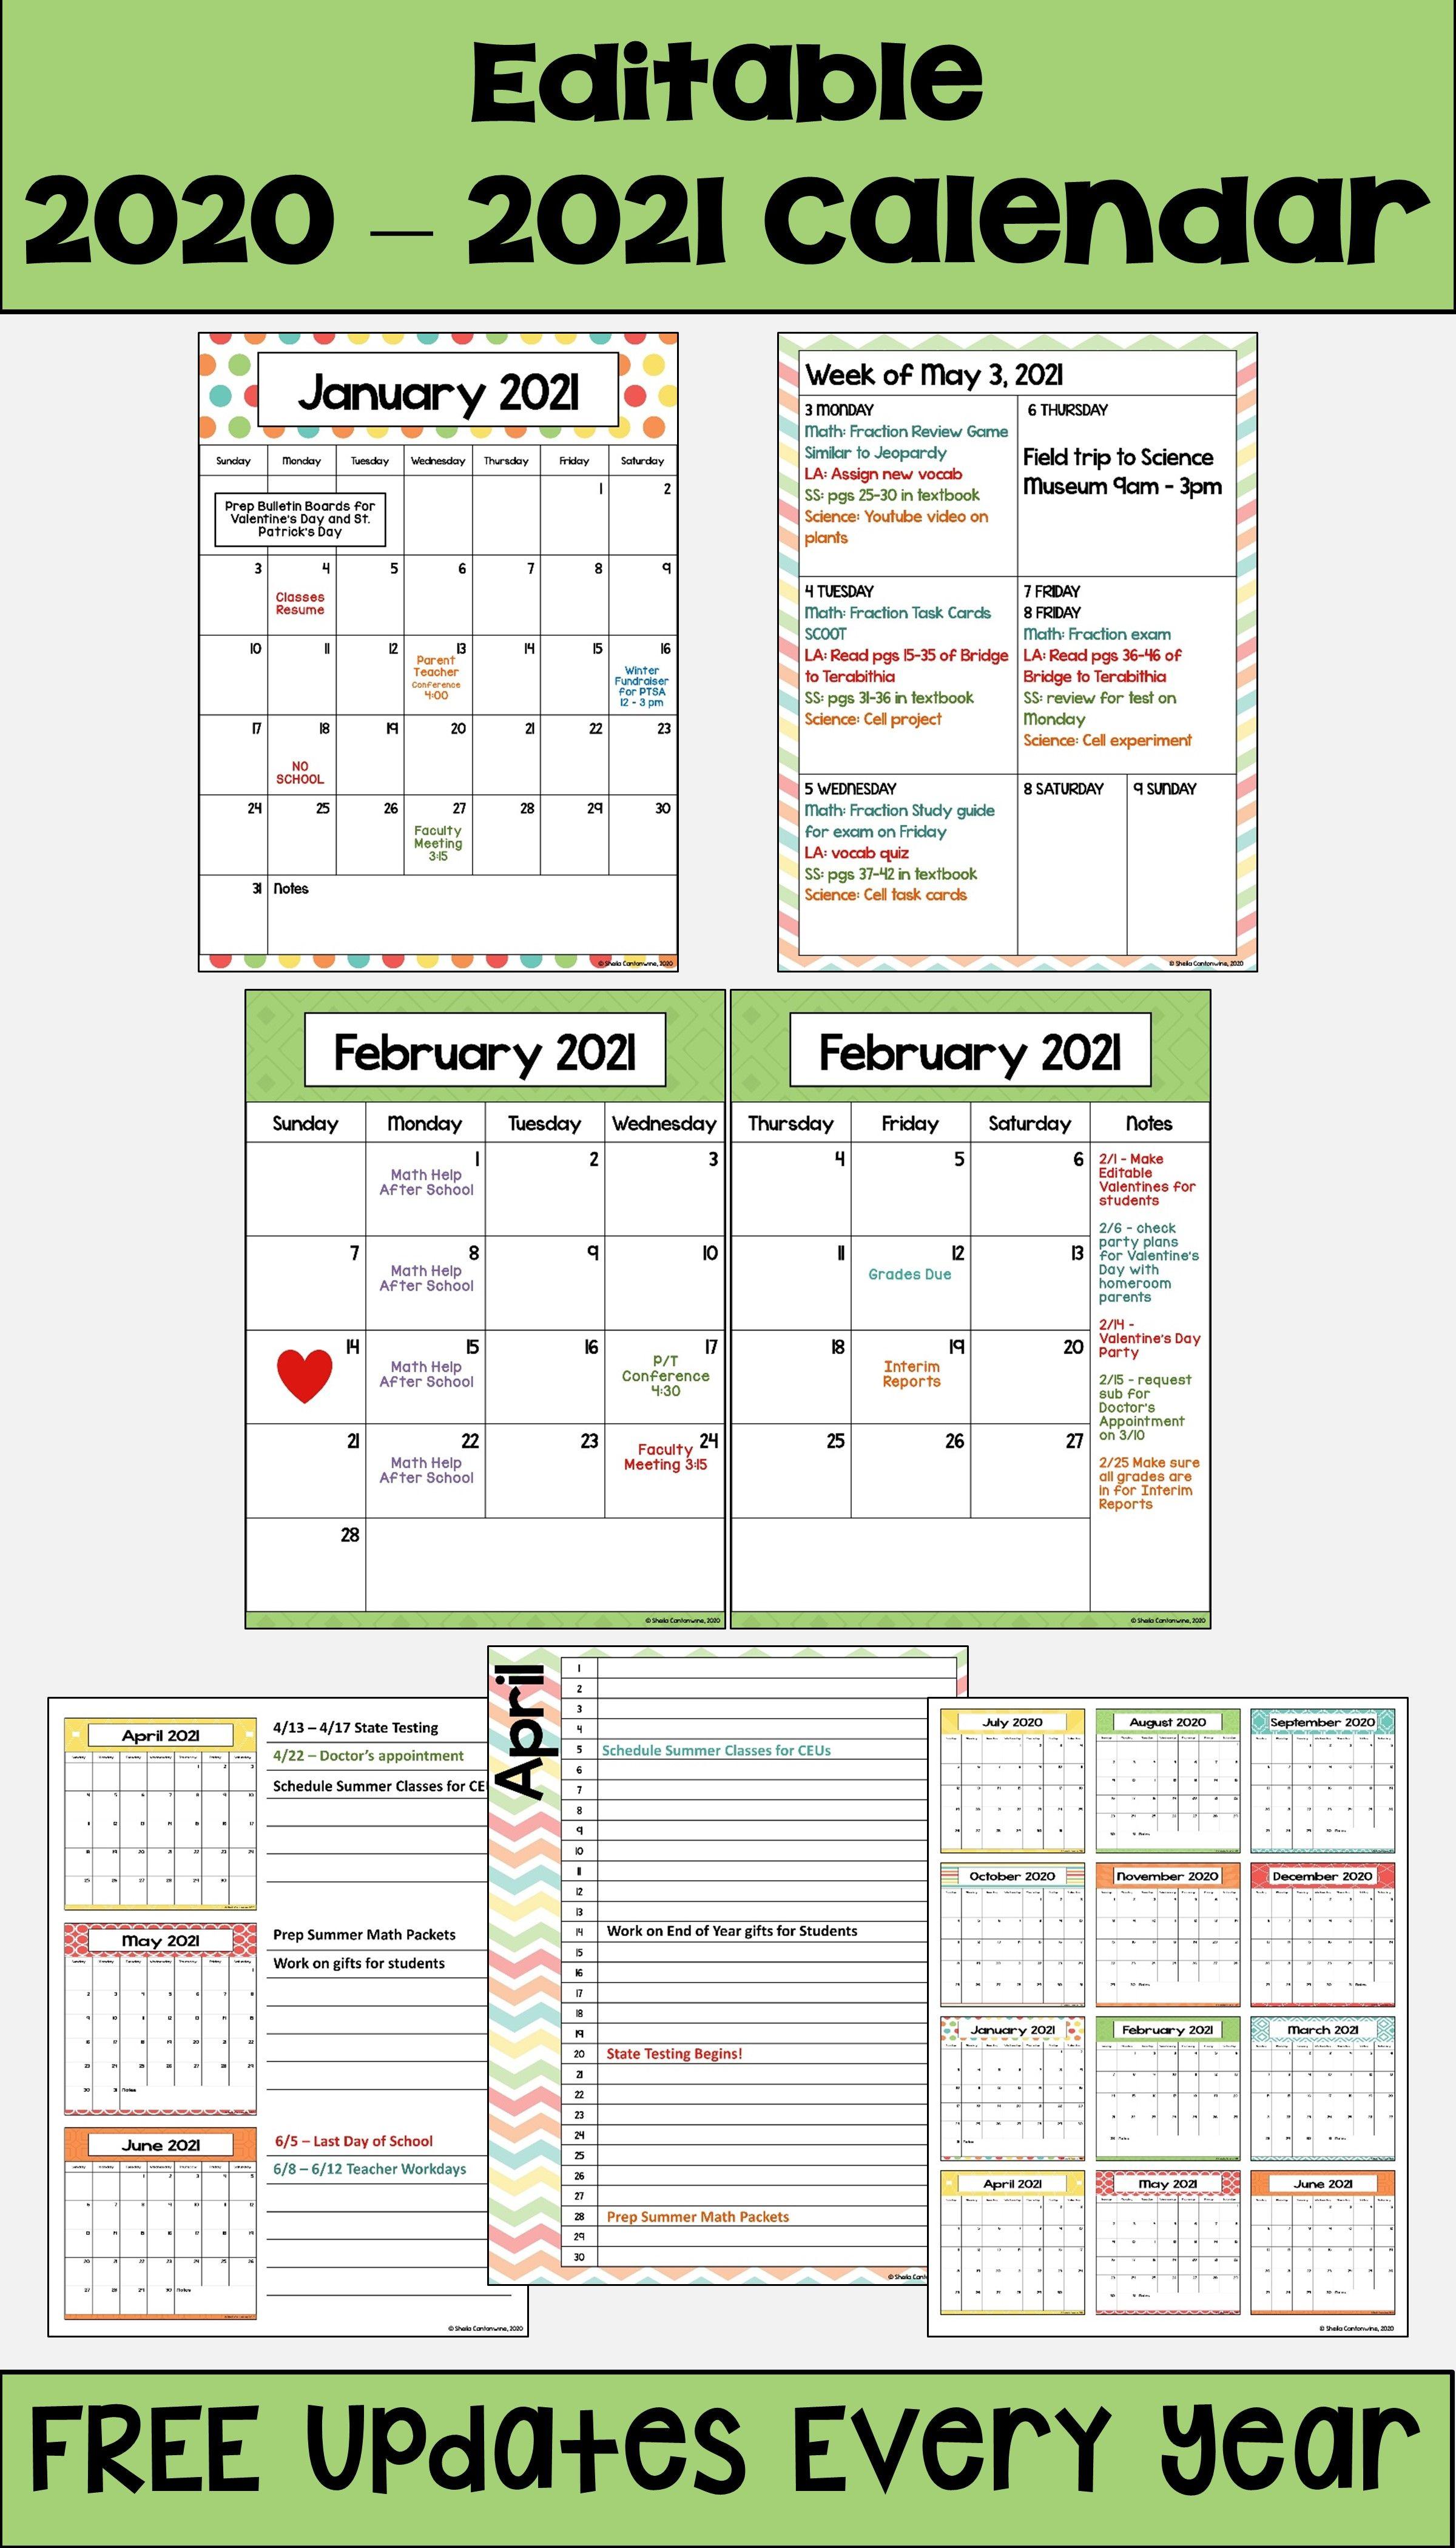 2020 2021 Calendar Printable And Editable With Free Updates In Pastel Colors In 2020 2021 Calendar School Calendar Teacher Planner